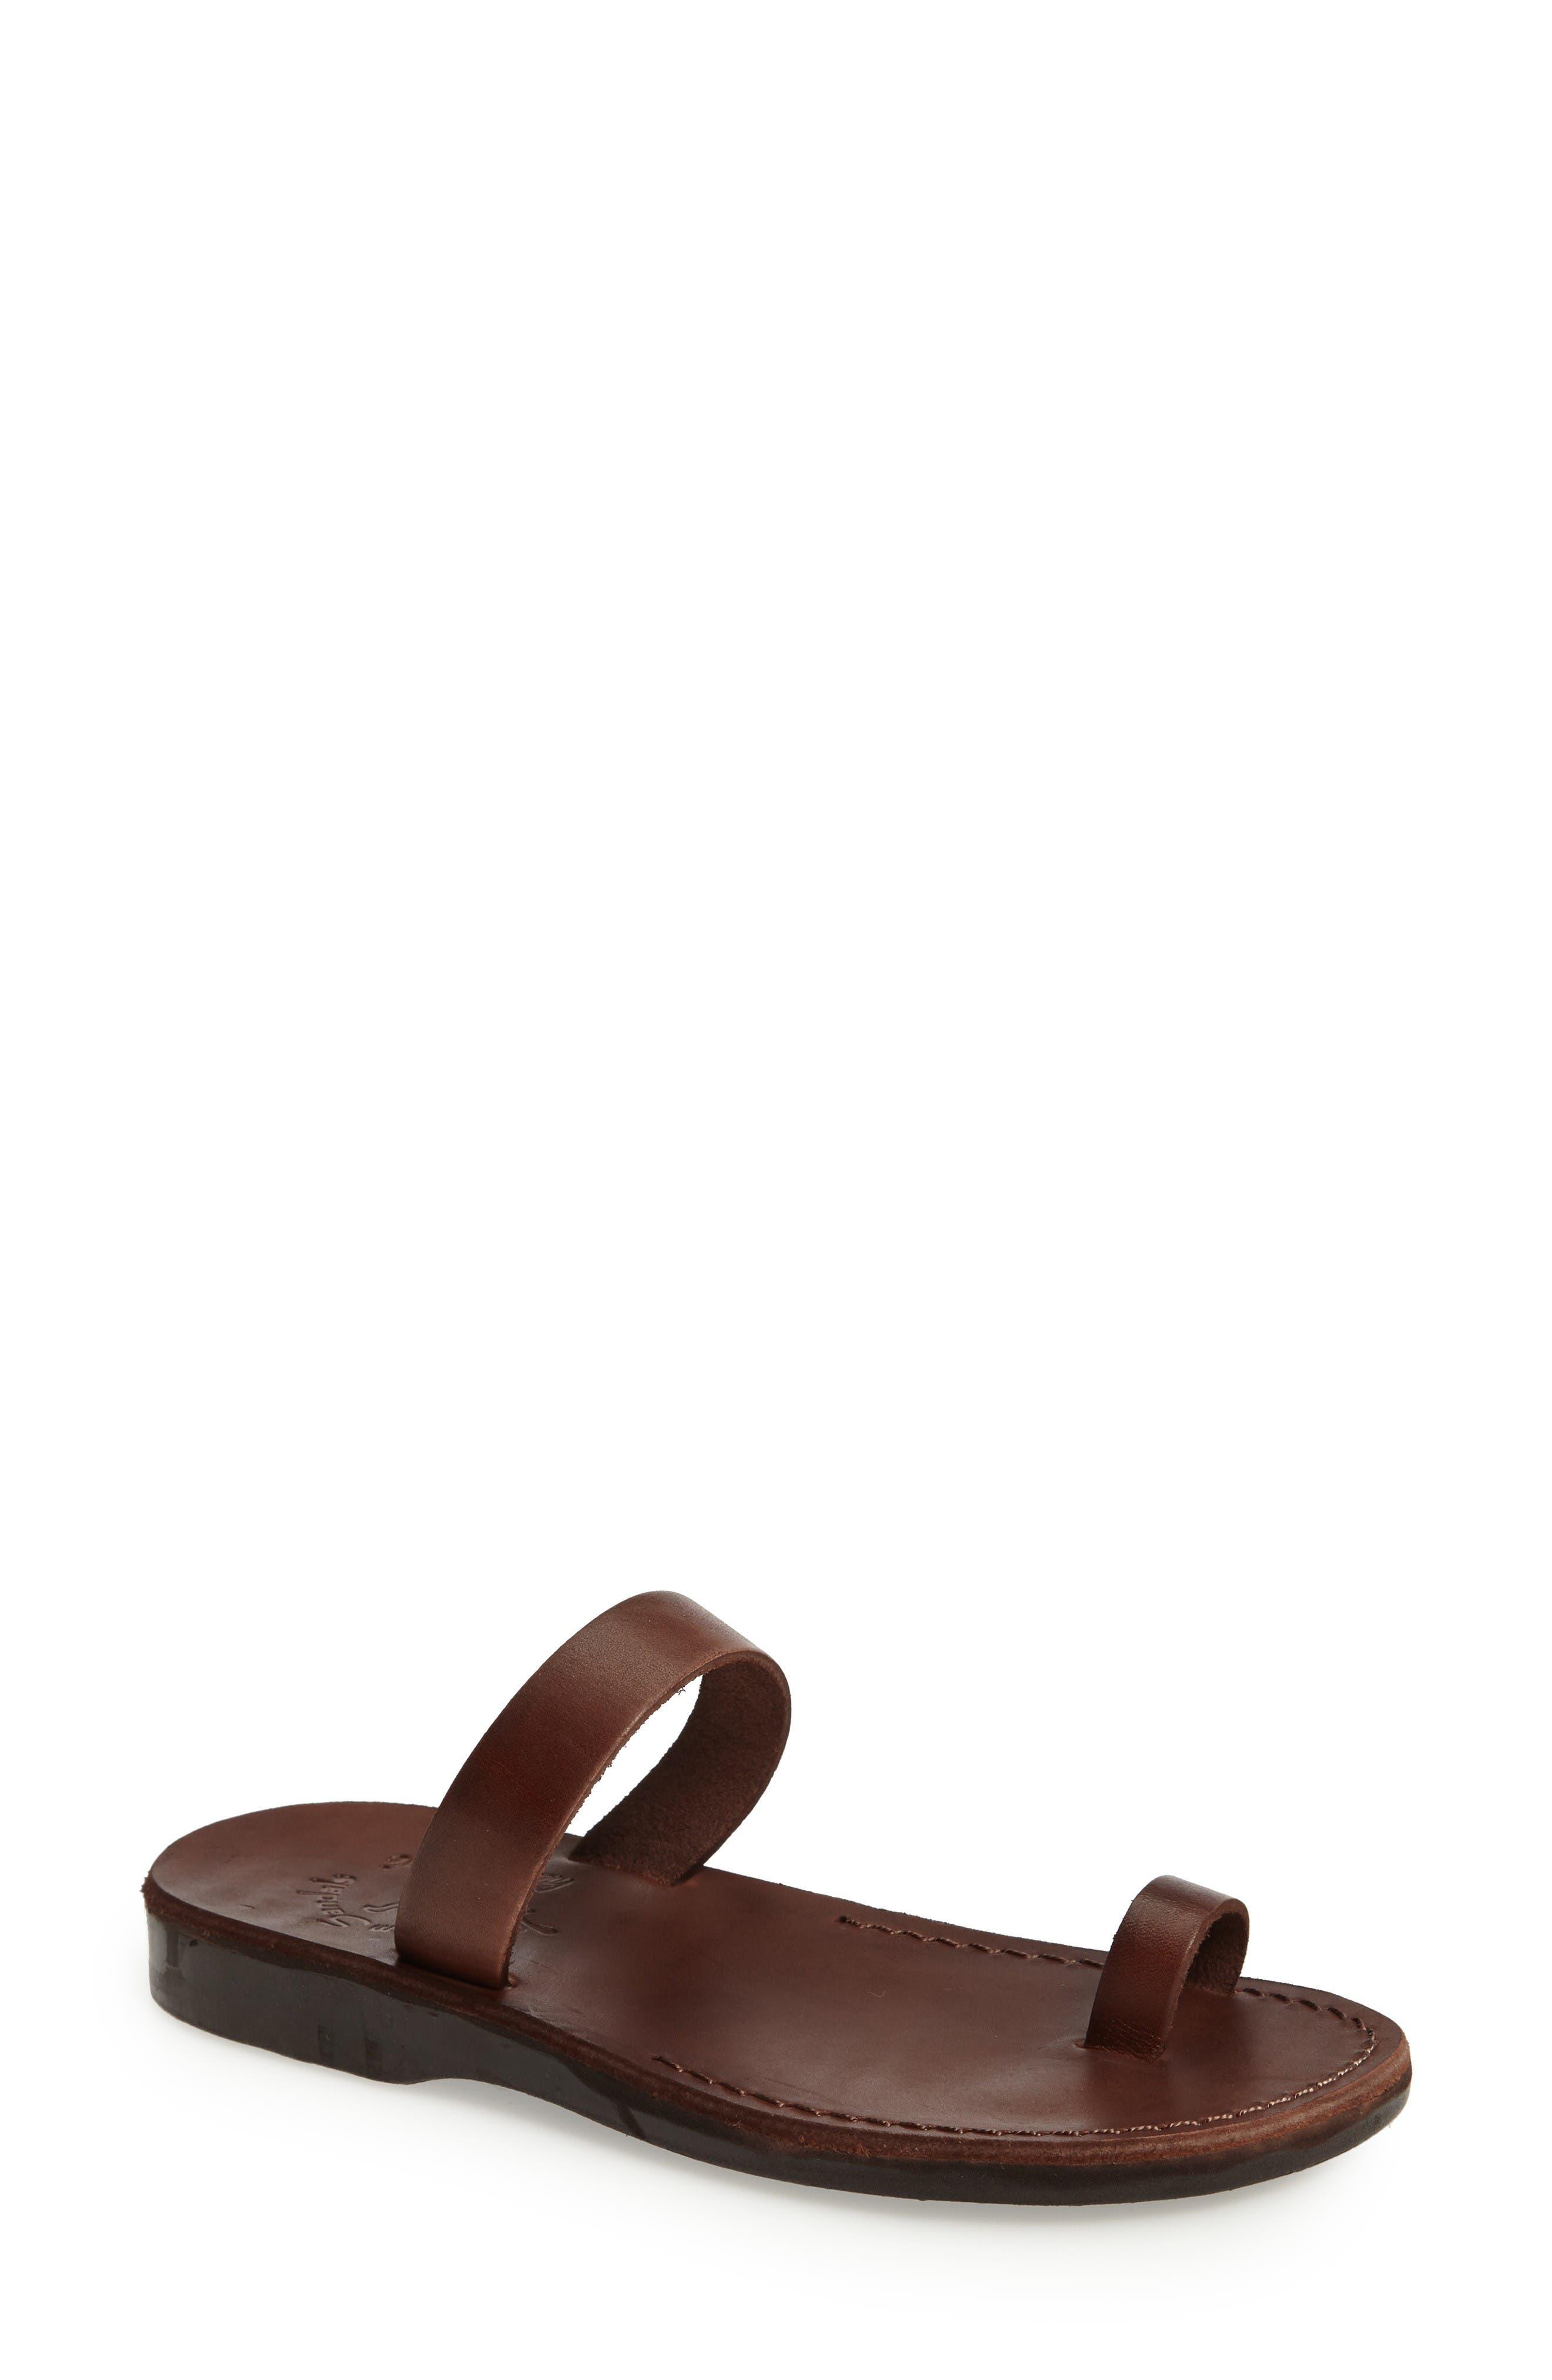 Alternate Image 1 Selected - Jerusalem Sandals Eden Toe Loop Sandal (Women)